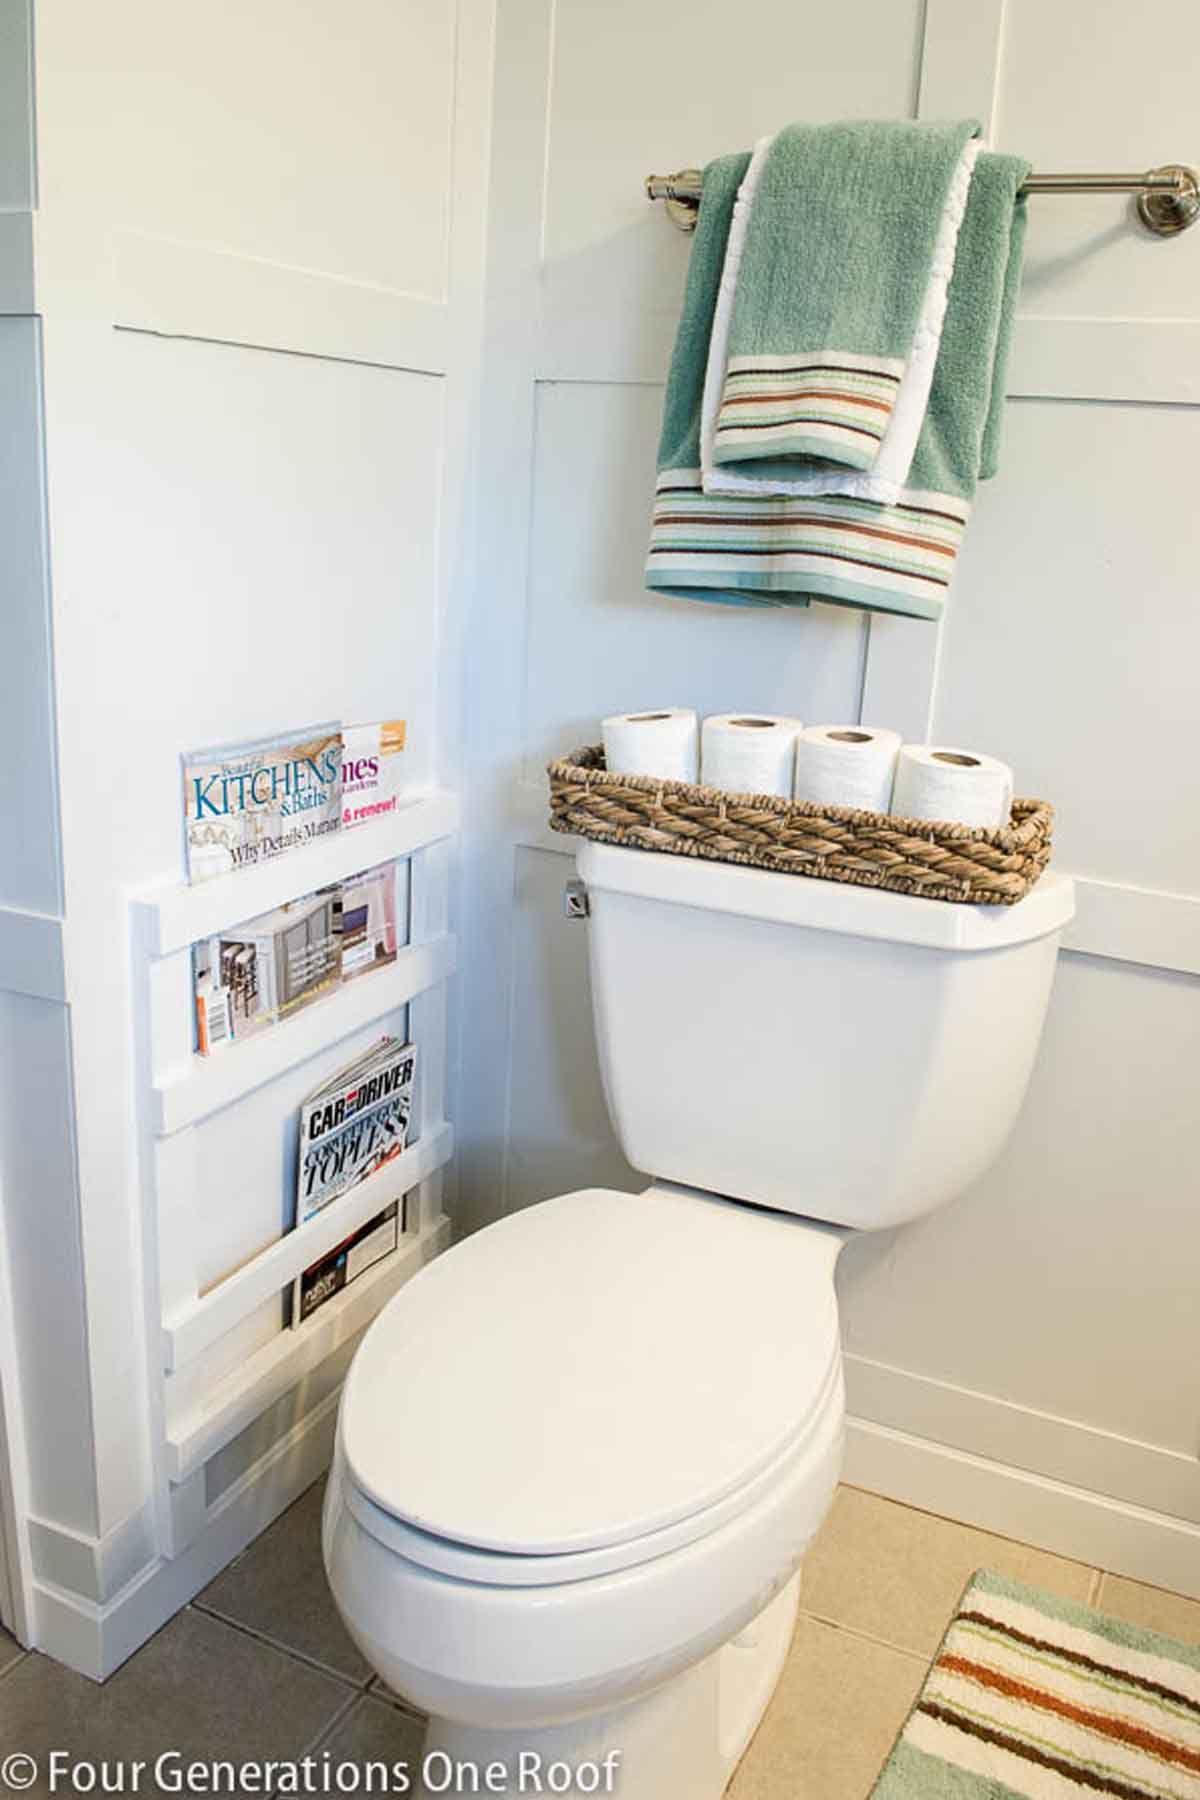 These Bathroom Organization Ideas Will Make Your Mornings So Much Easier Bathroom Organization Diy Diy Bathroom Rustic Bathroom Fixtures